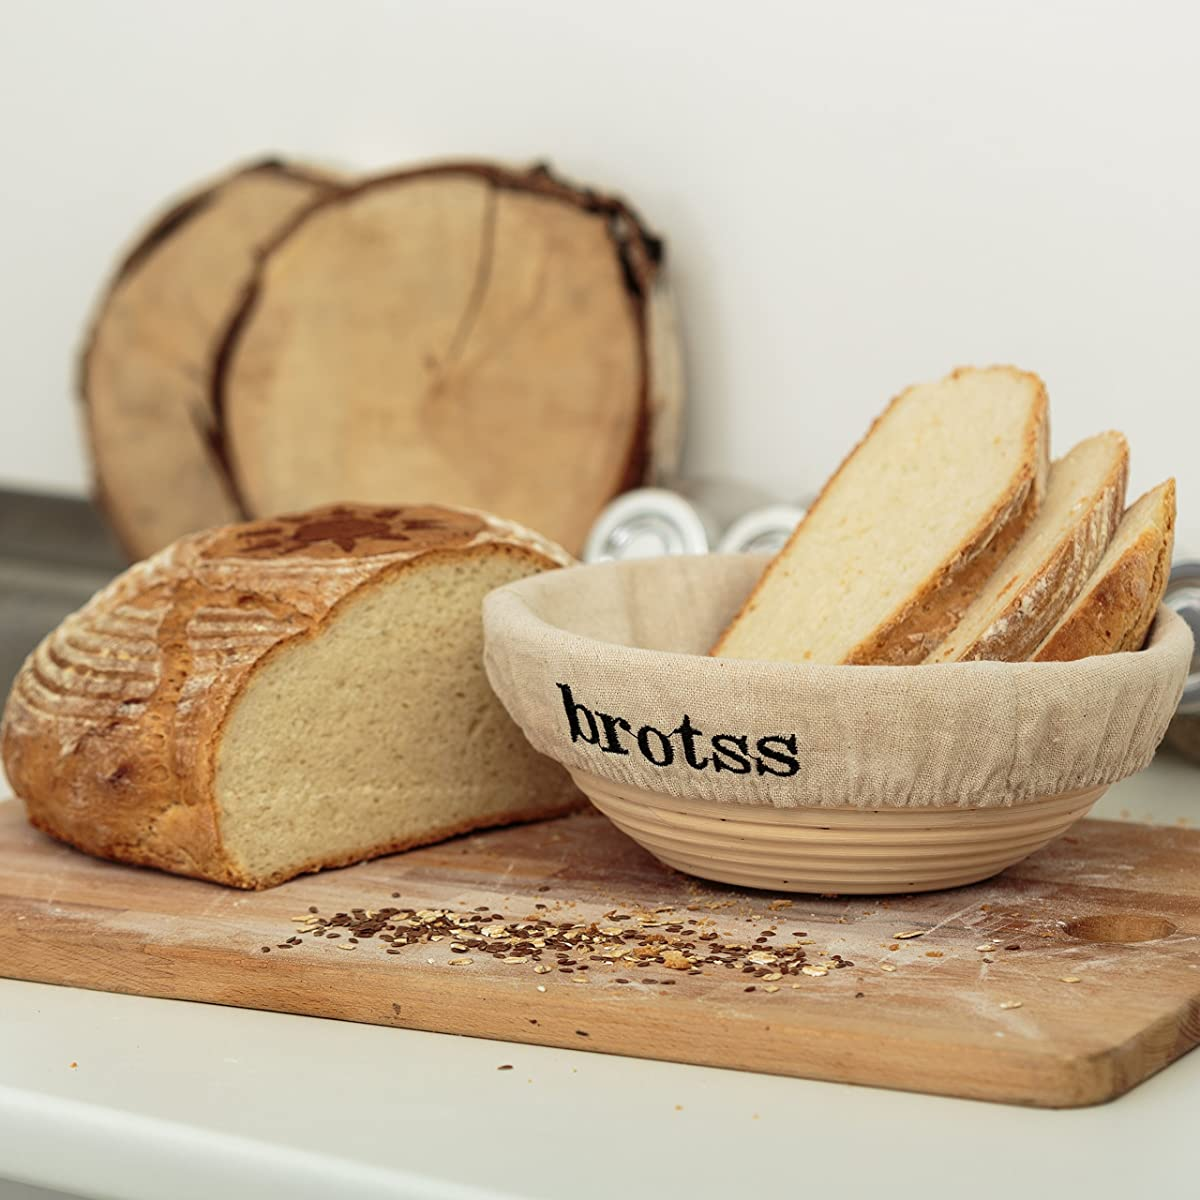 brotss Banneton Proofing Basket Round 8,66 Inch, Bundle with 4 Artisan Bread Stencils + Cloth Liner + Dough Scraper & Cutter + eBook - Artisan Rattan Brotform Set